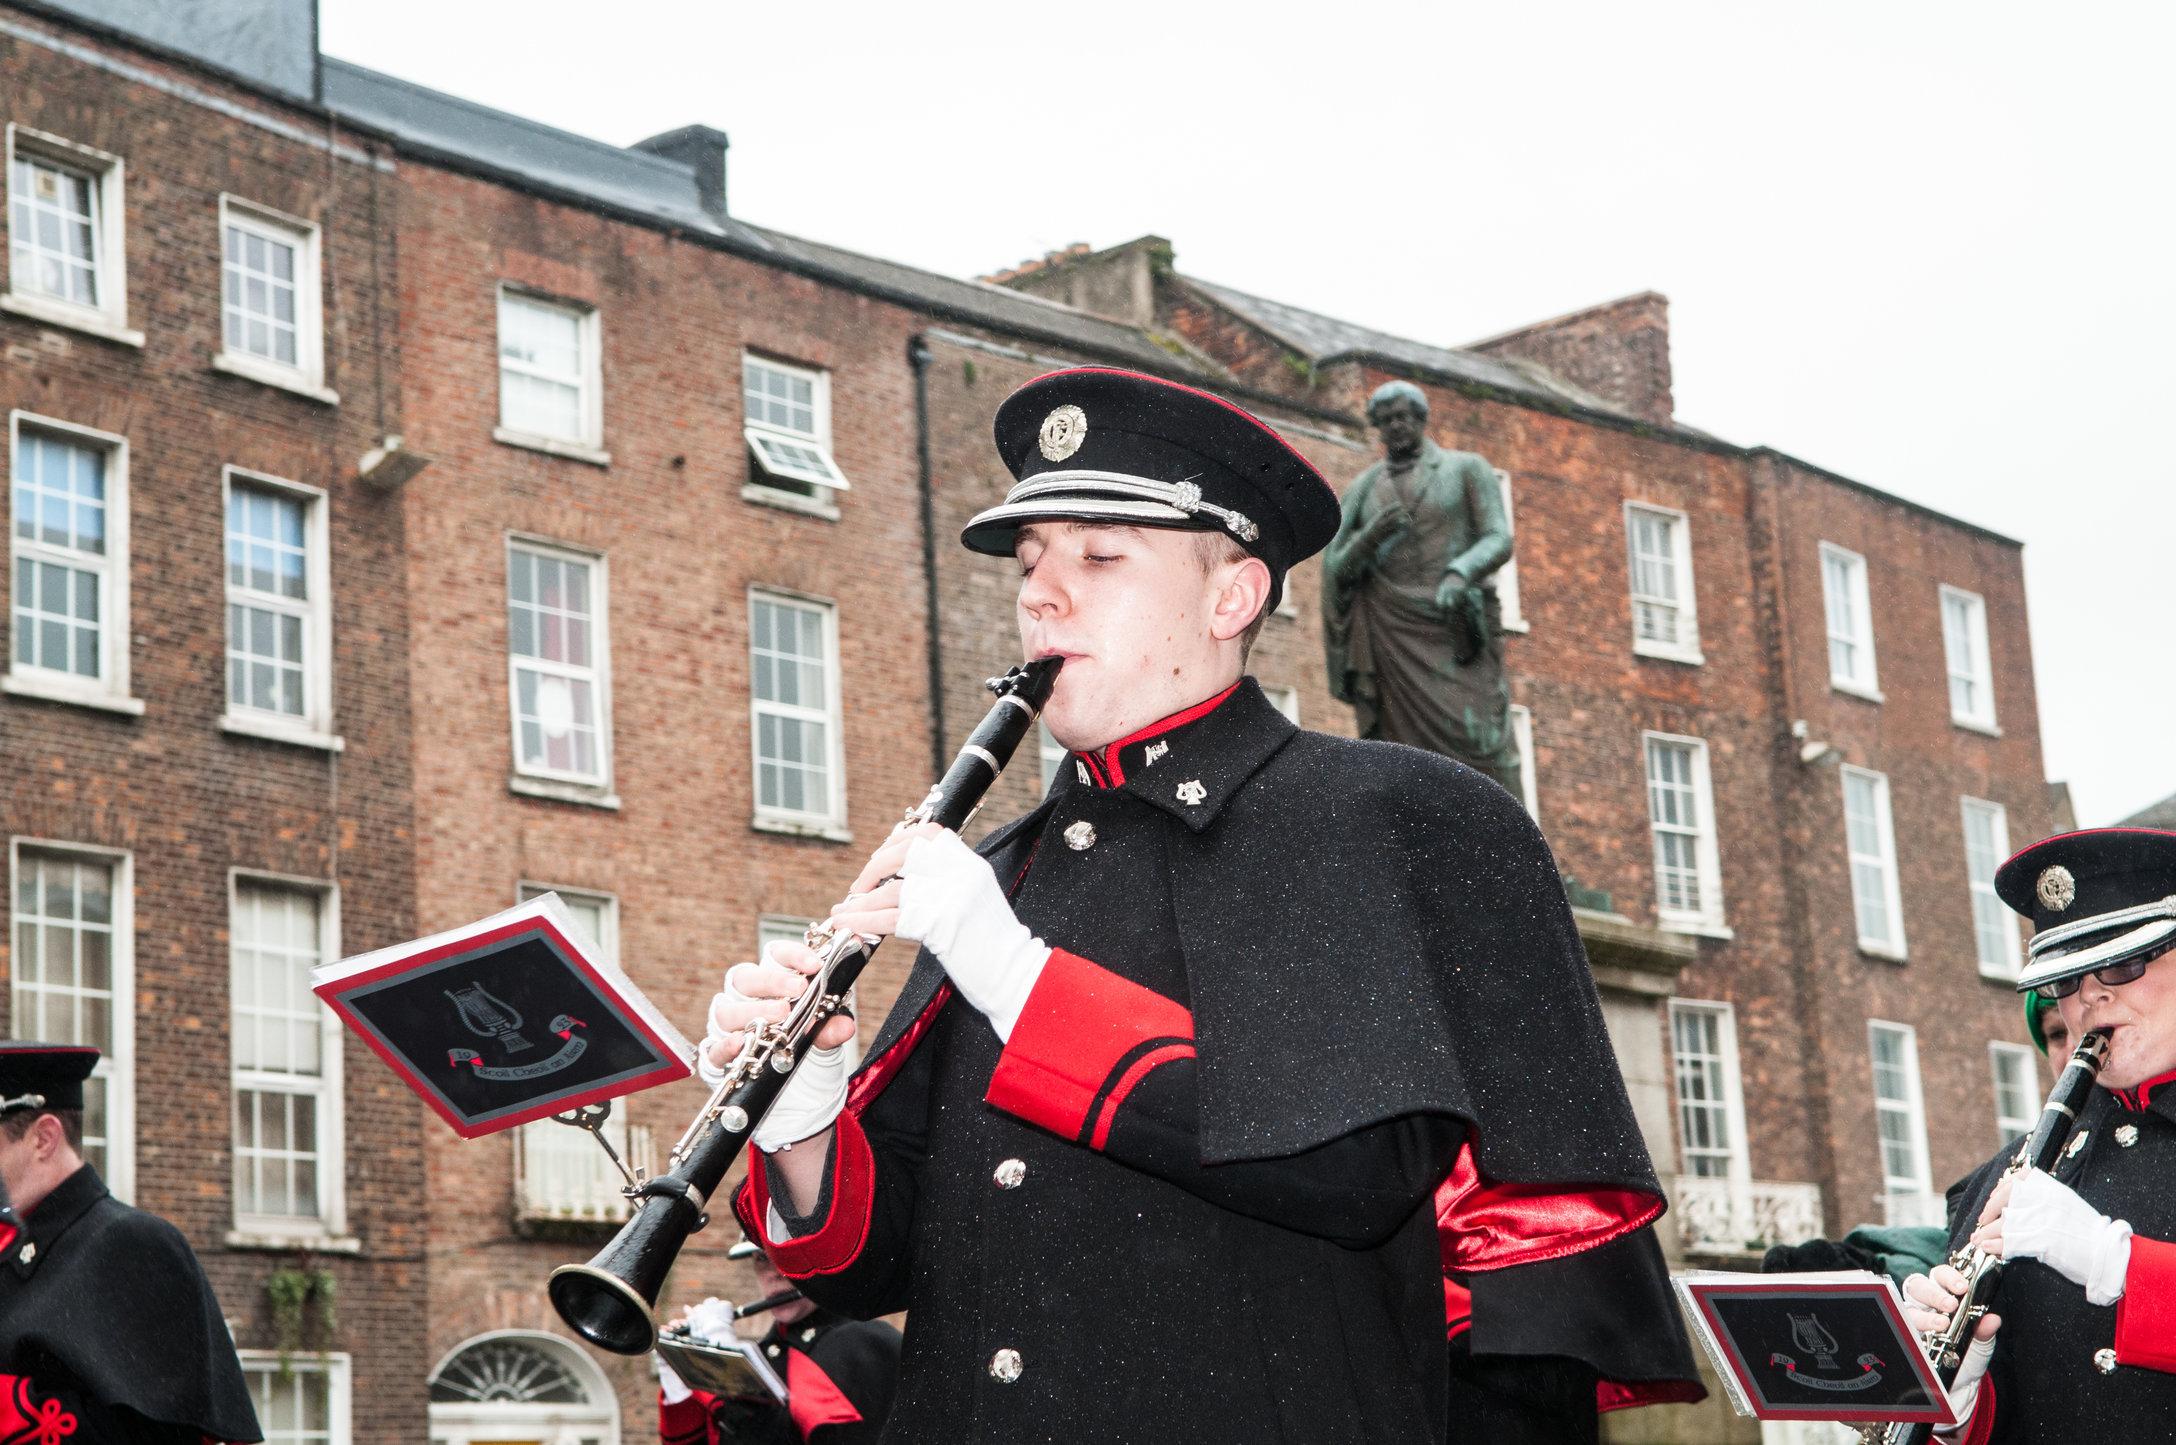 Army Band, 1 Brigade